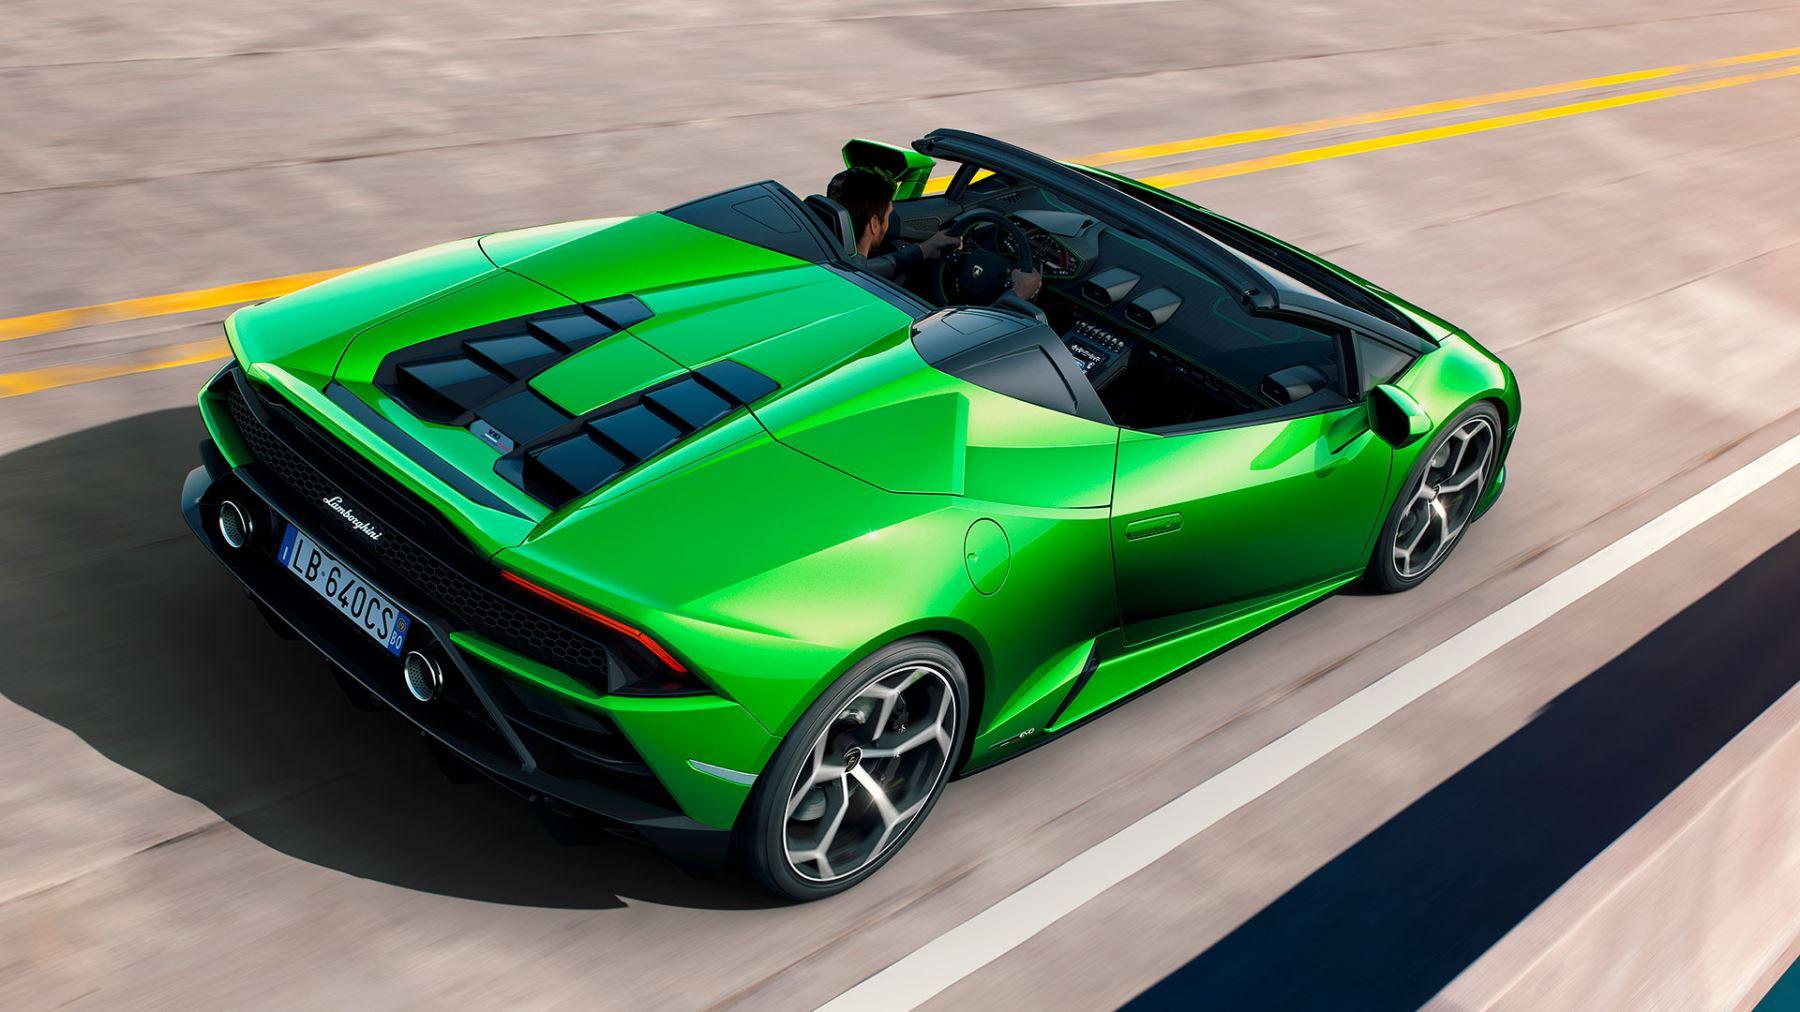 Lamborghini Huracan EVO Spyder - Every Day Amplified image 9